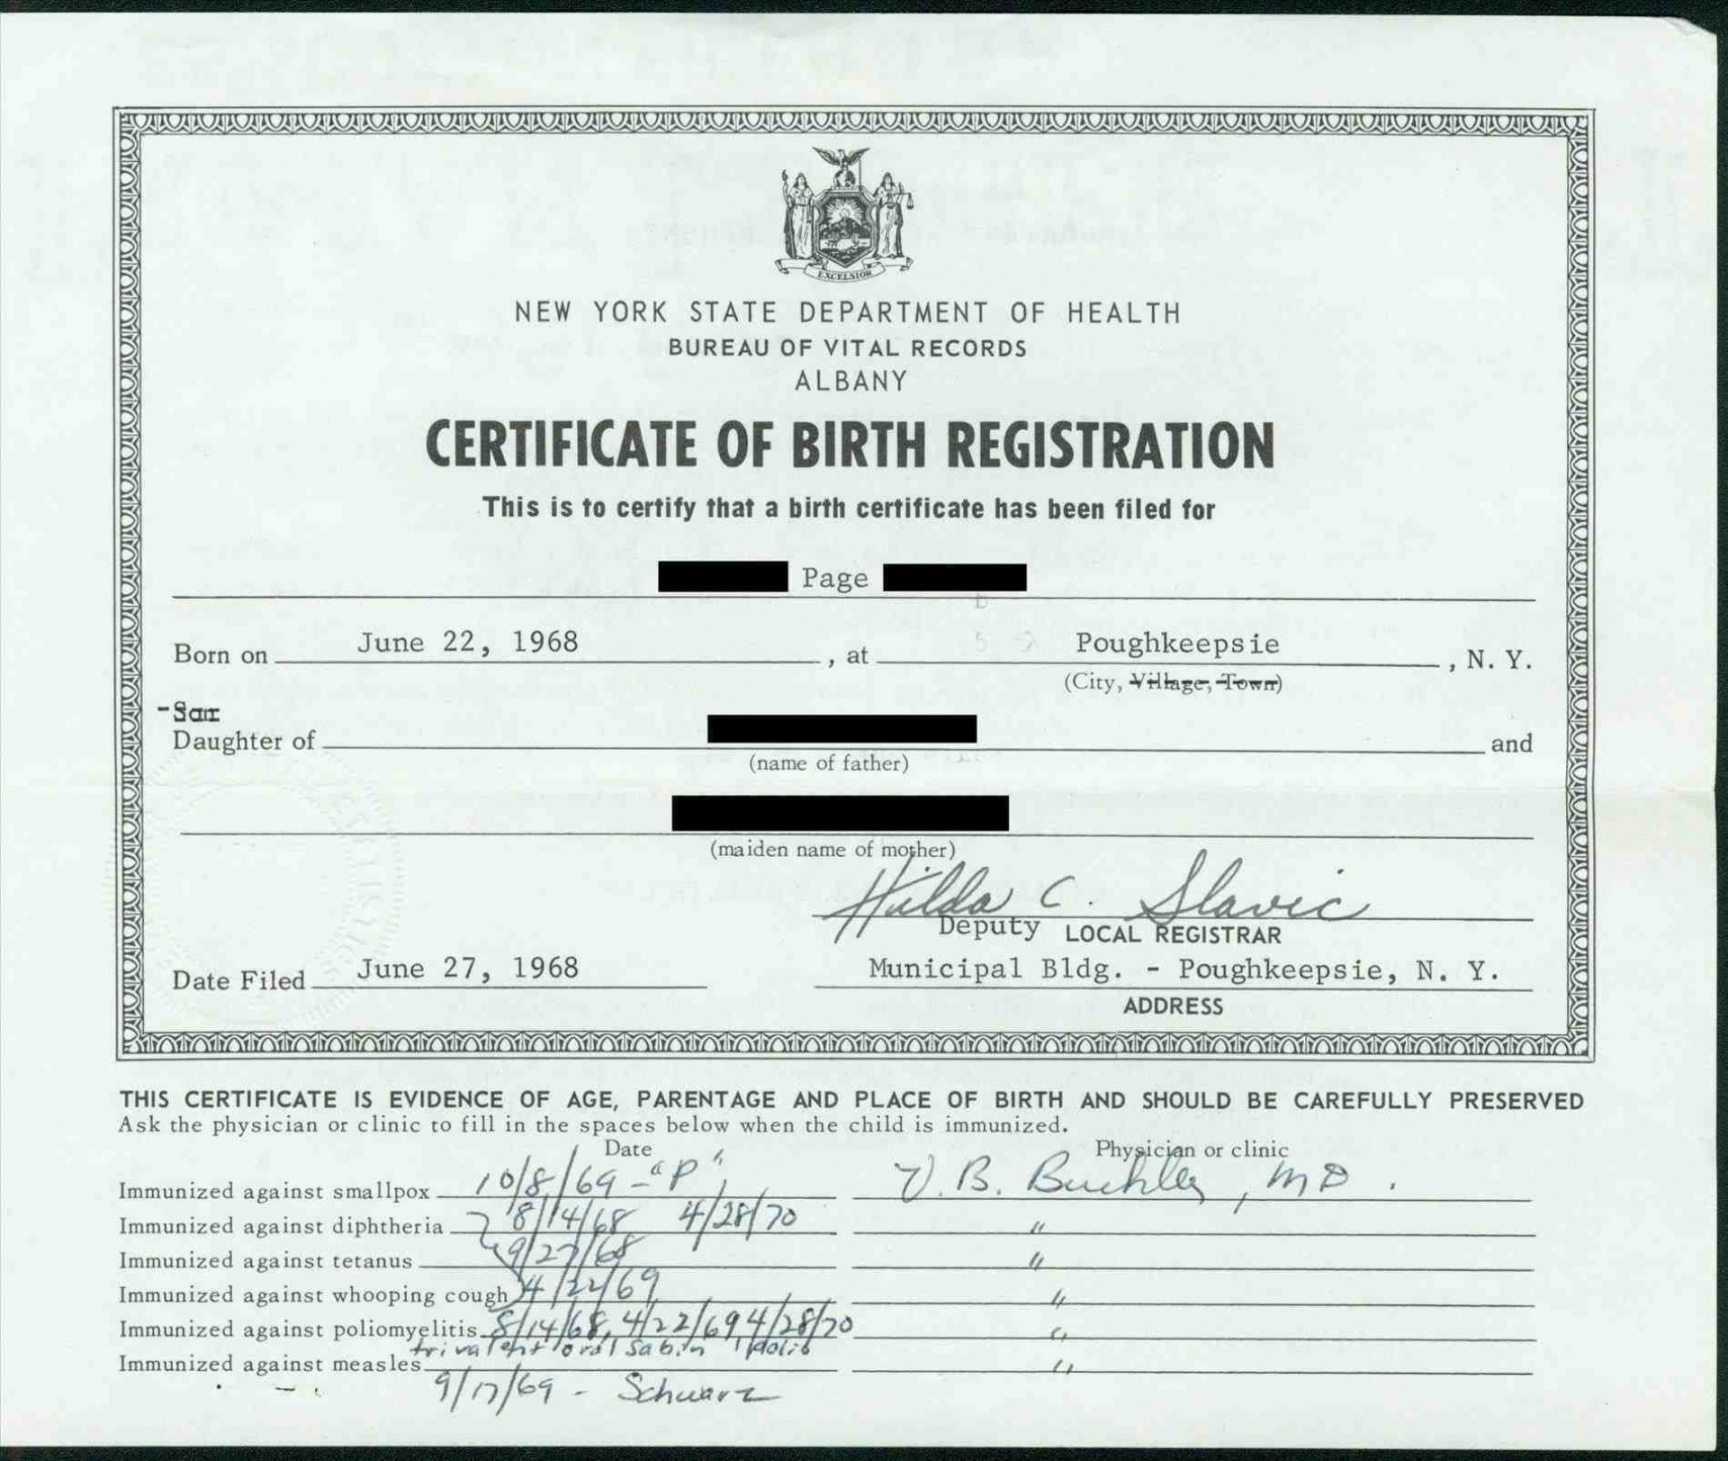 German Birth Certificate Template - Calep.midnightpig.co In Birth Certificate Template Uk